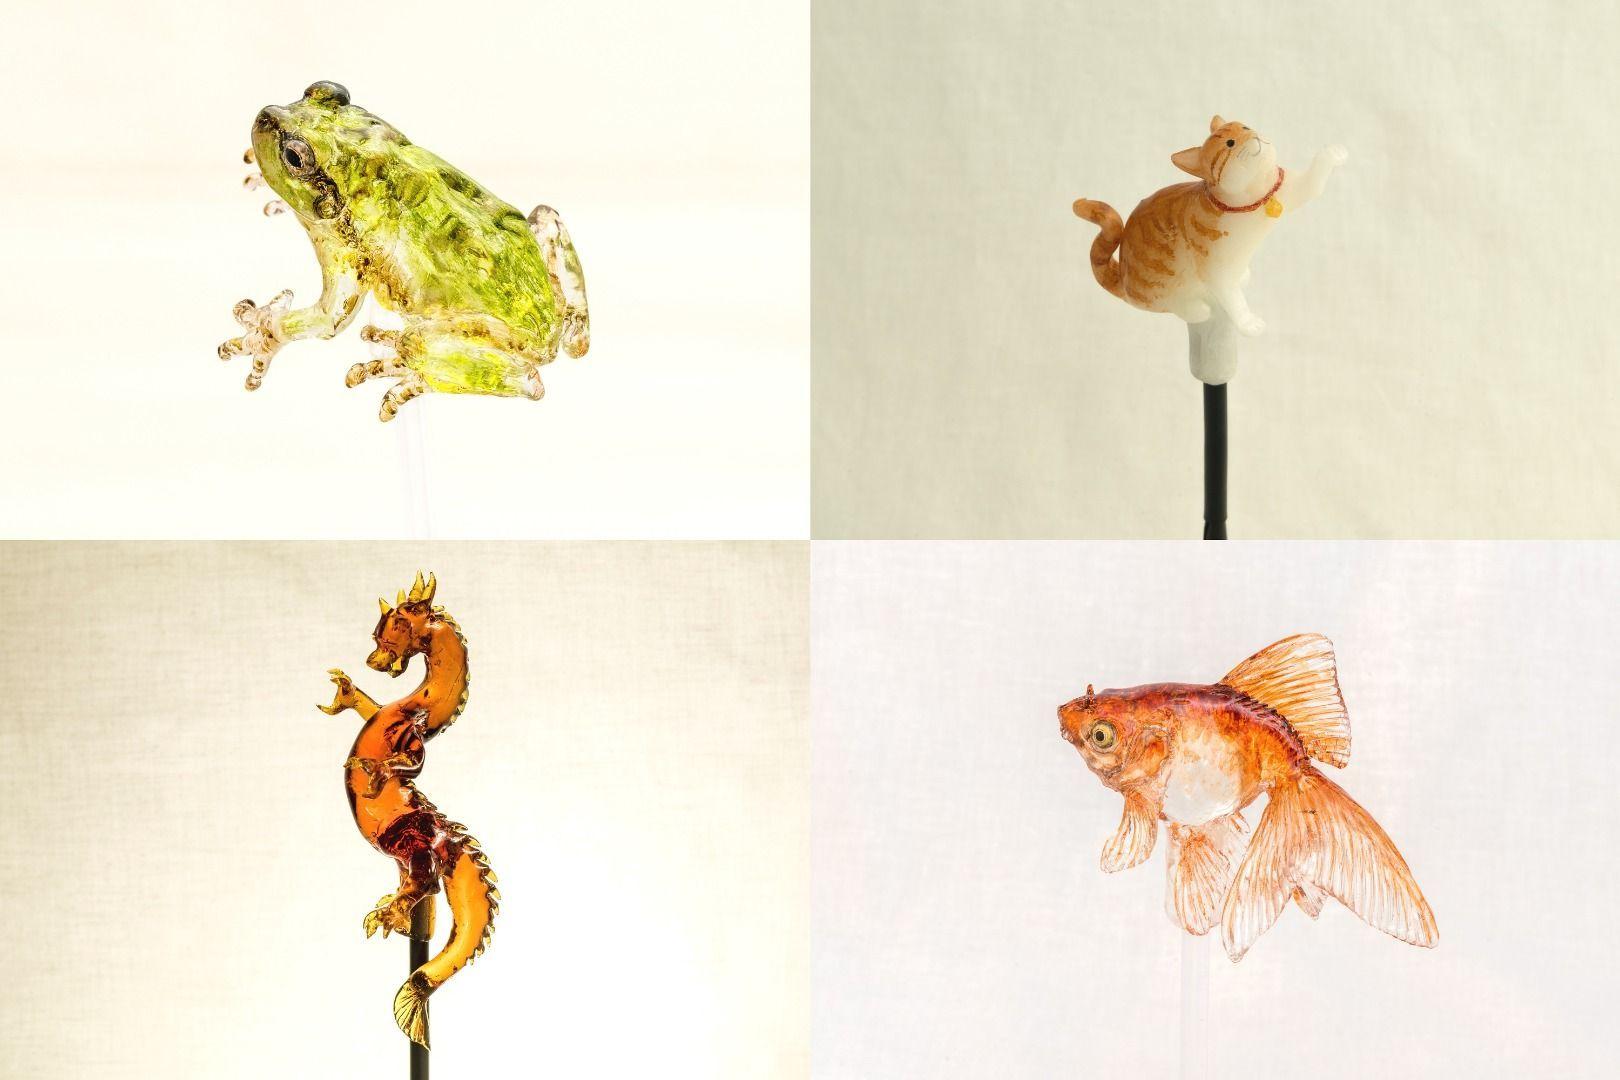 Real-Looking Handheld Fans and Gold Fish! Asakusa Amezaiku Workshop Ameshin